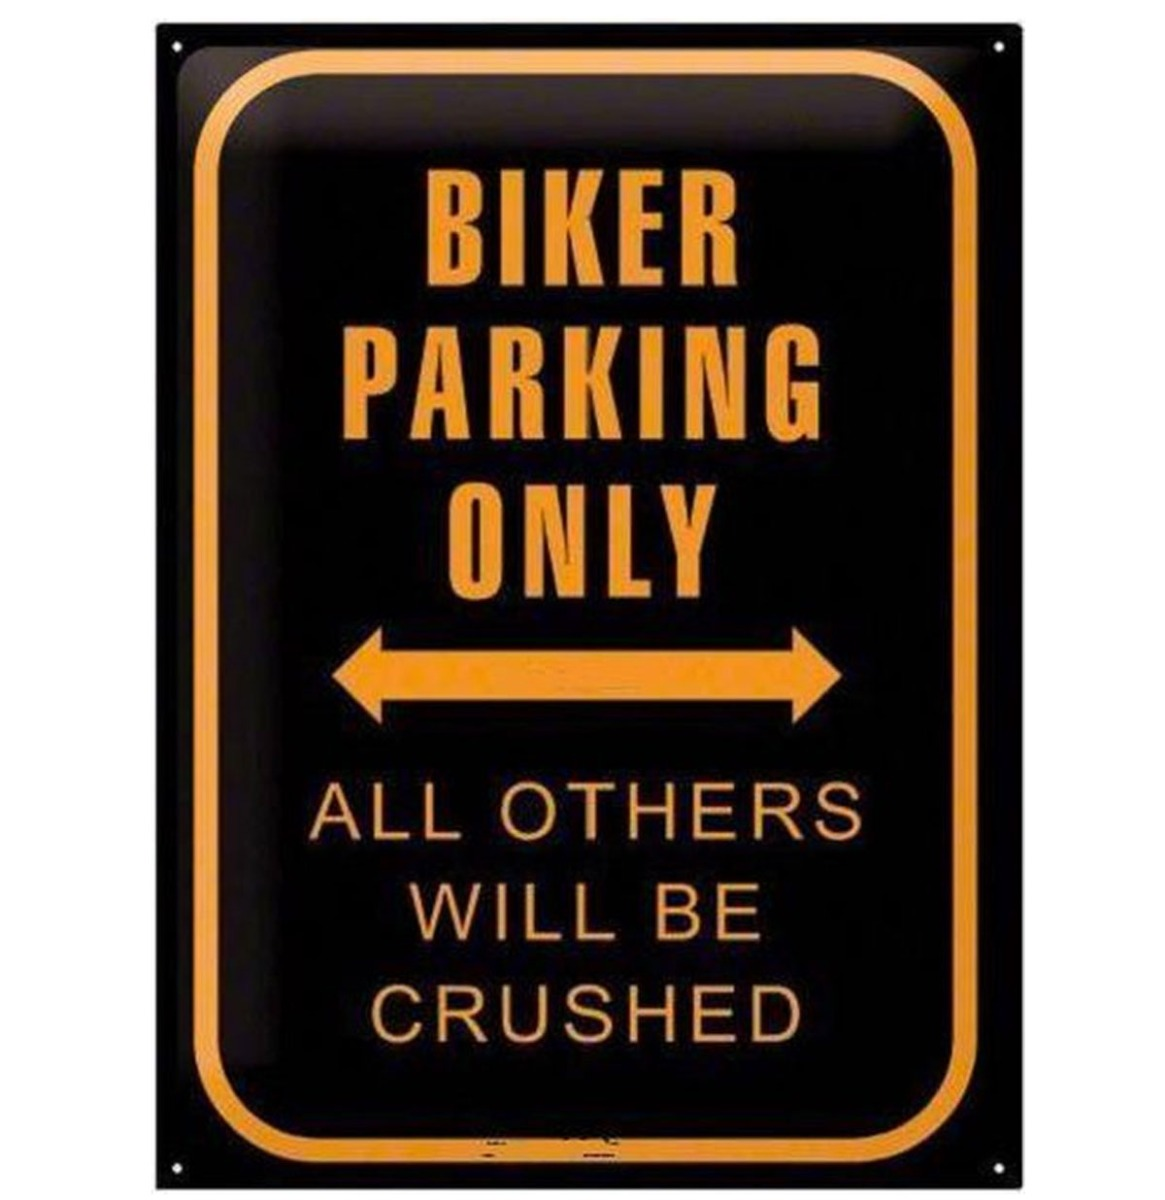 Biker Parking Only Metalen Bord 30 x 40 cm